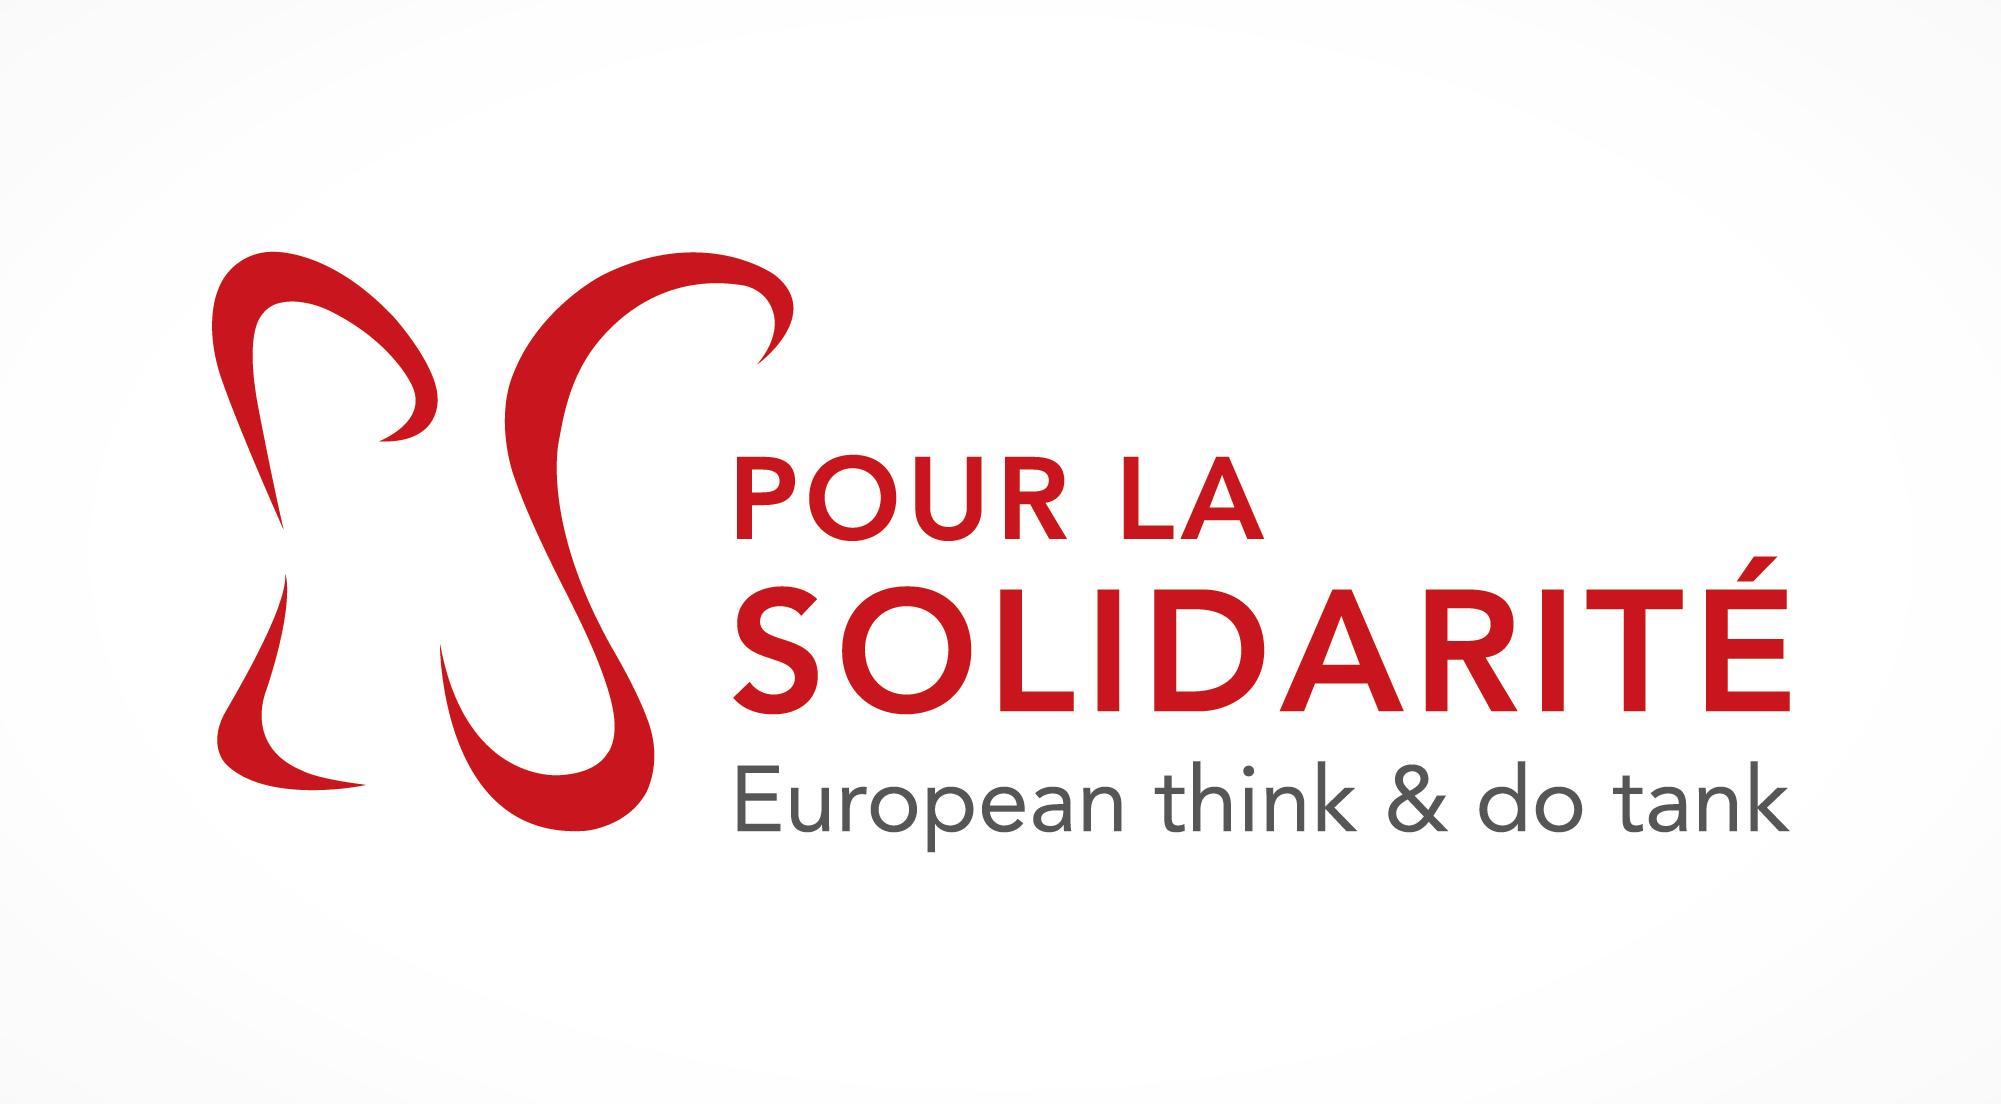 Pour La Solidarite